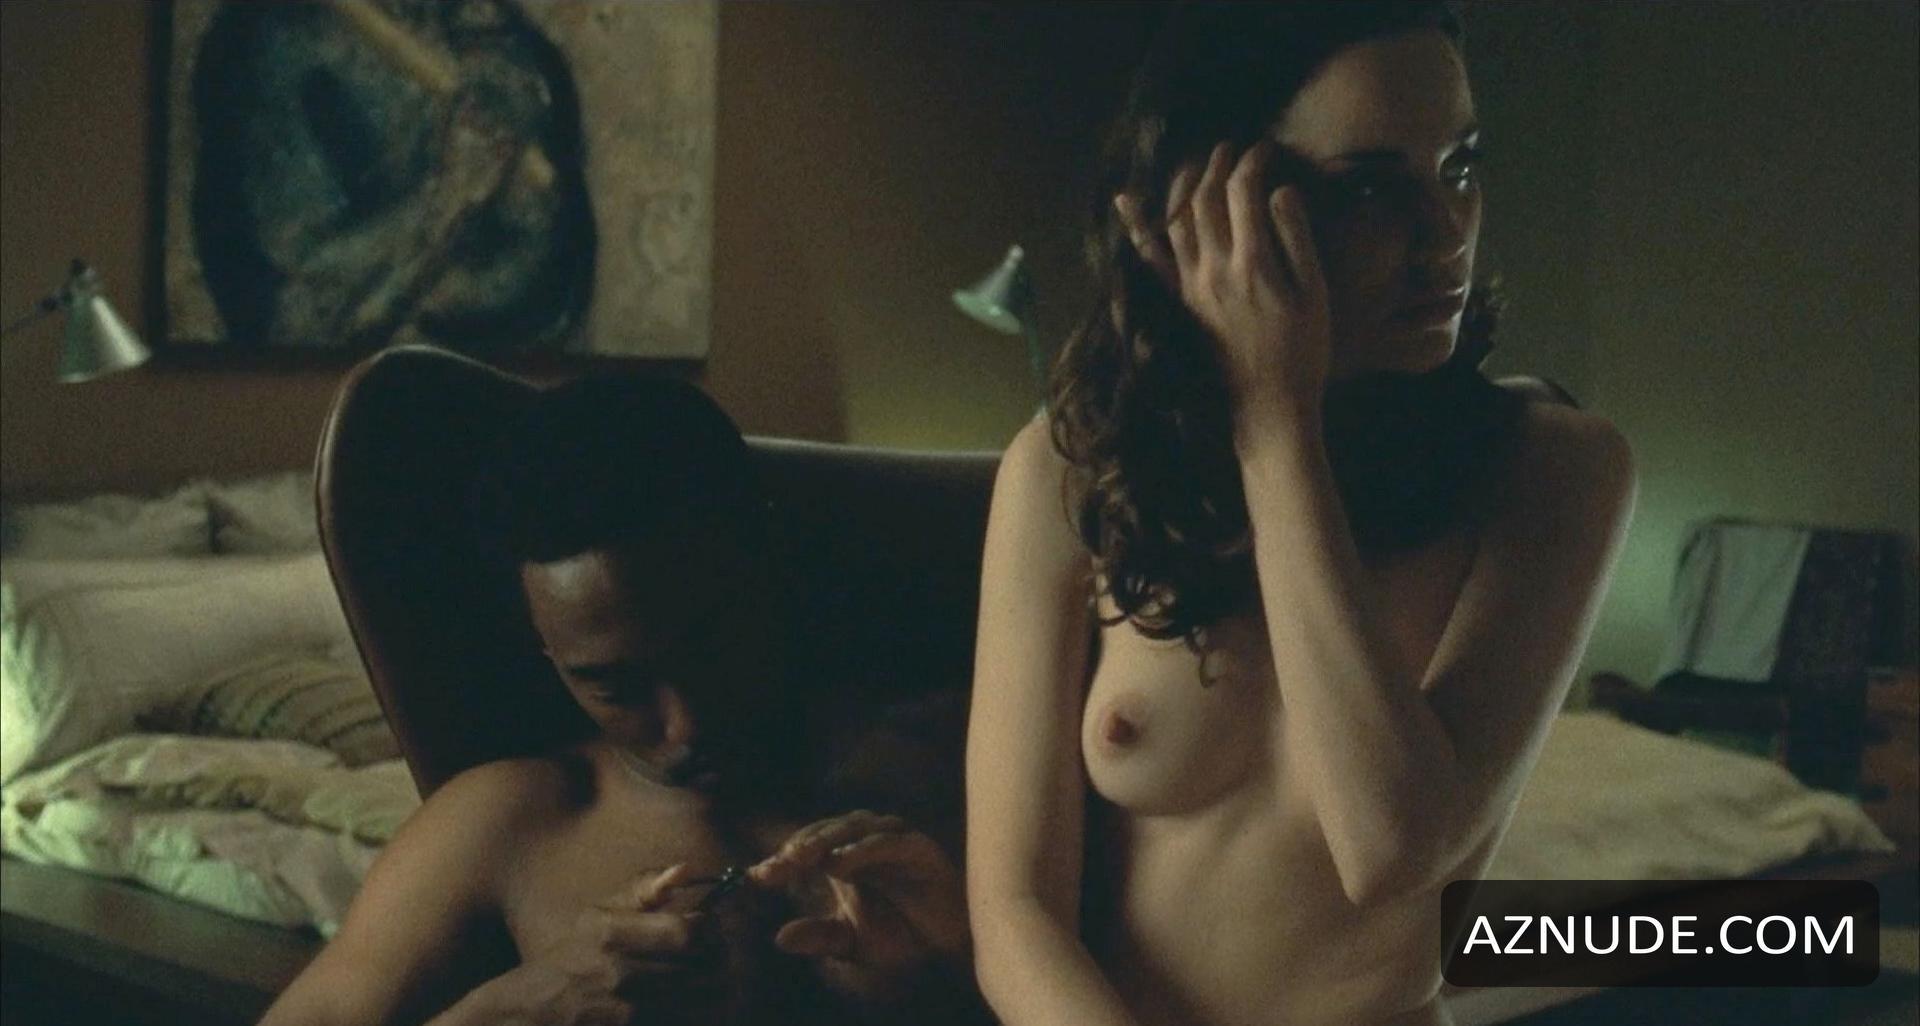 Kerry washington topless sex scene mampc - 1 part 1